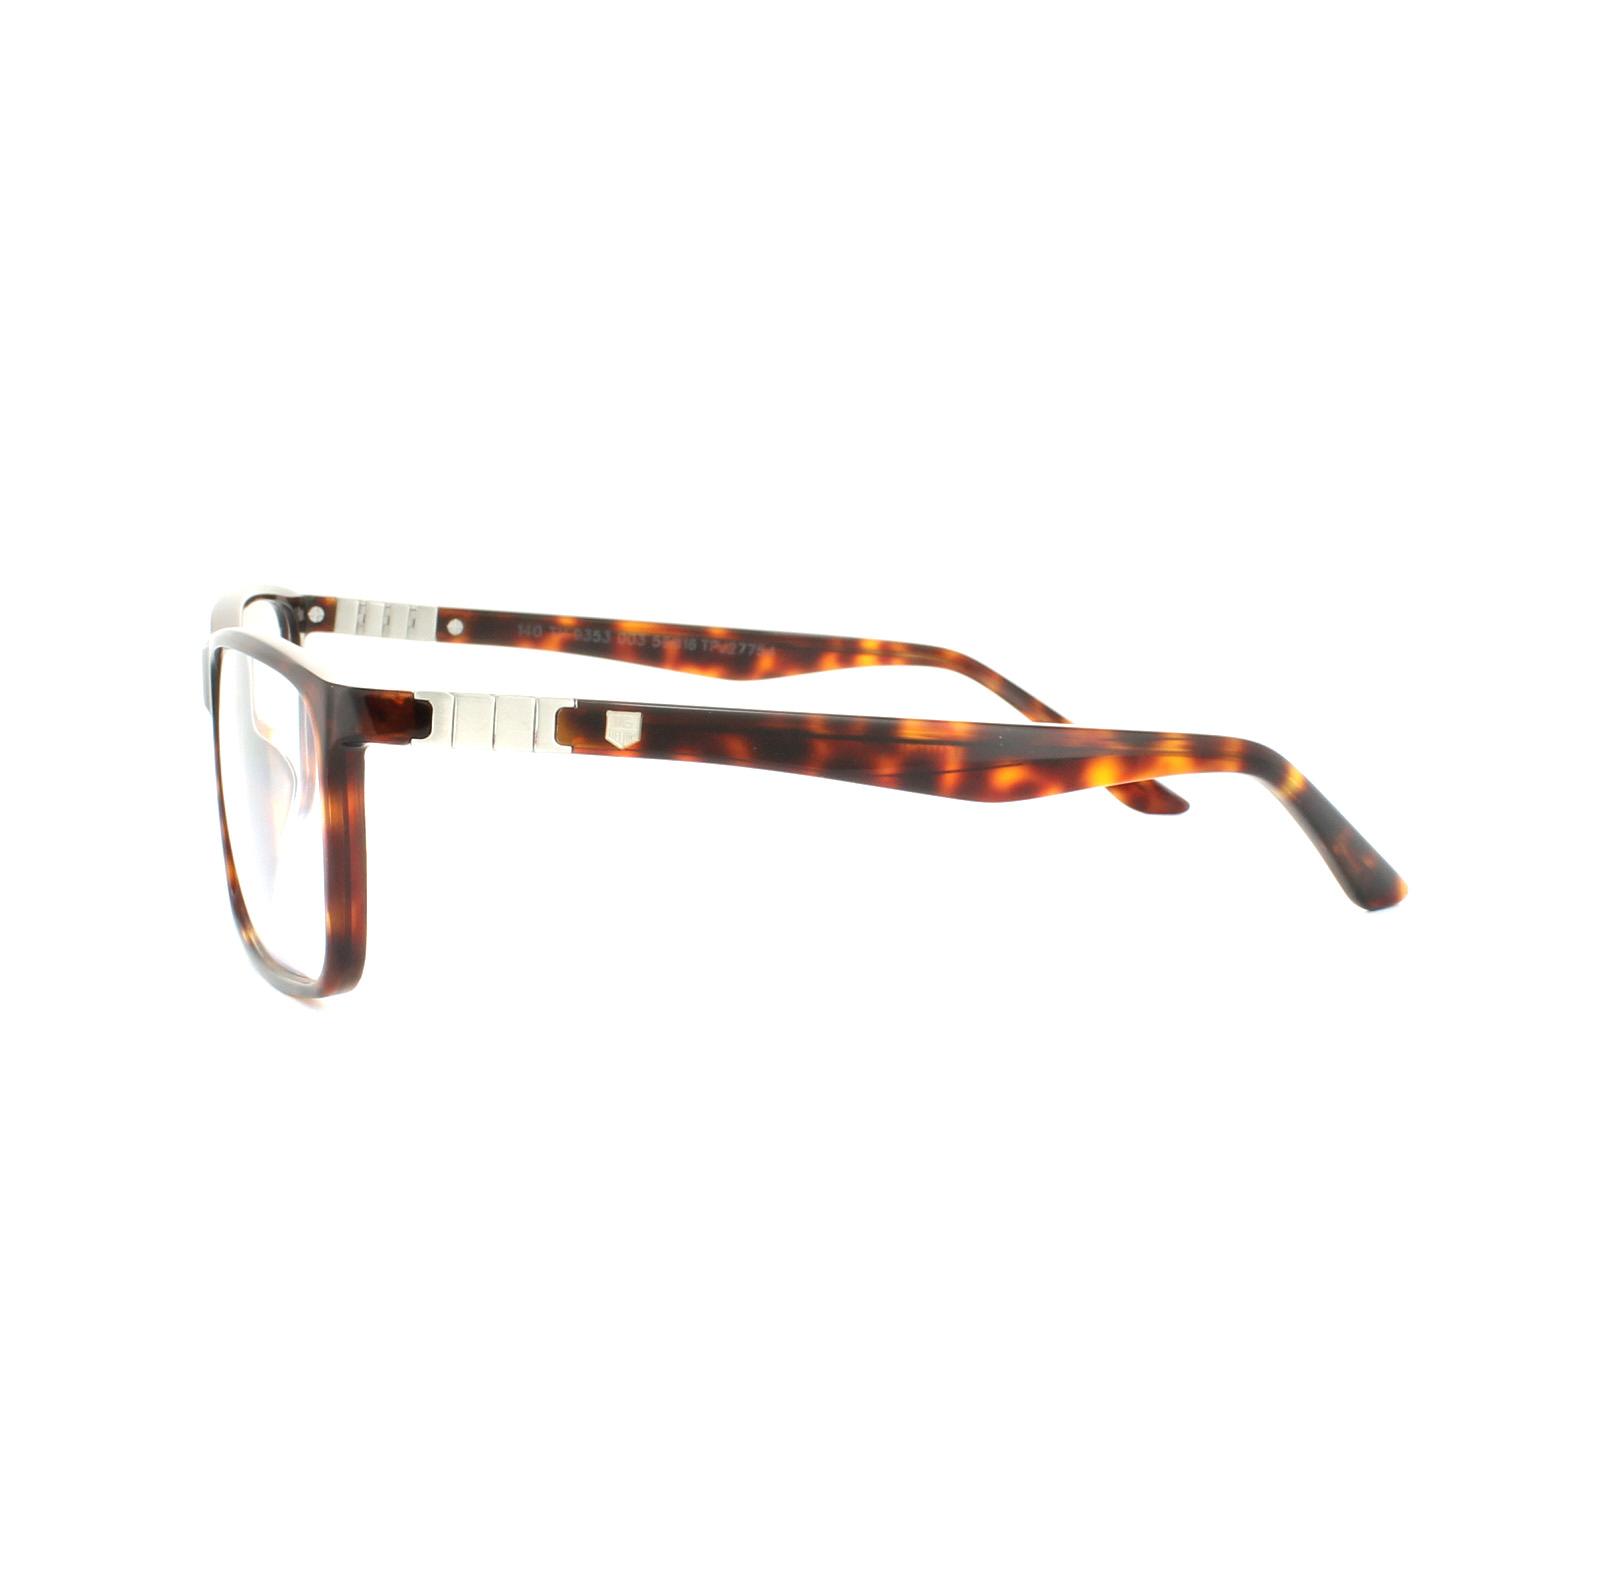 01fc4825c5 Sentinel Tag Heuer Glasses Frames Legend Acetate 9353 003 Tortoise